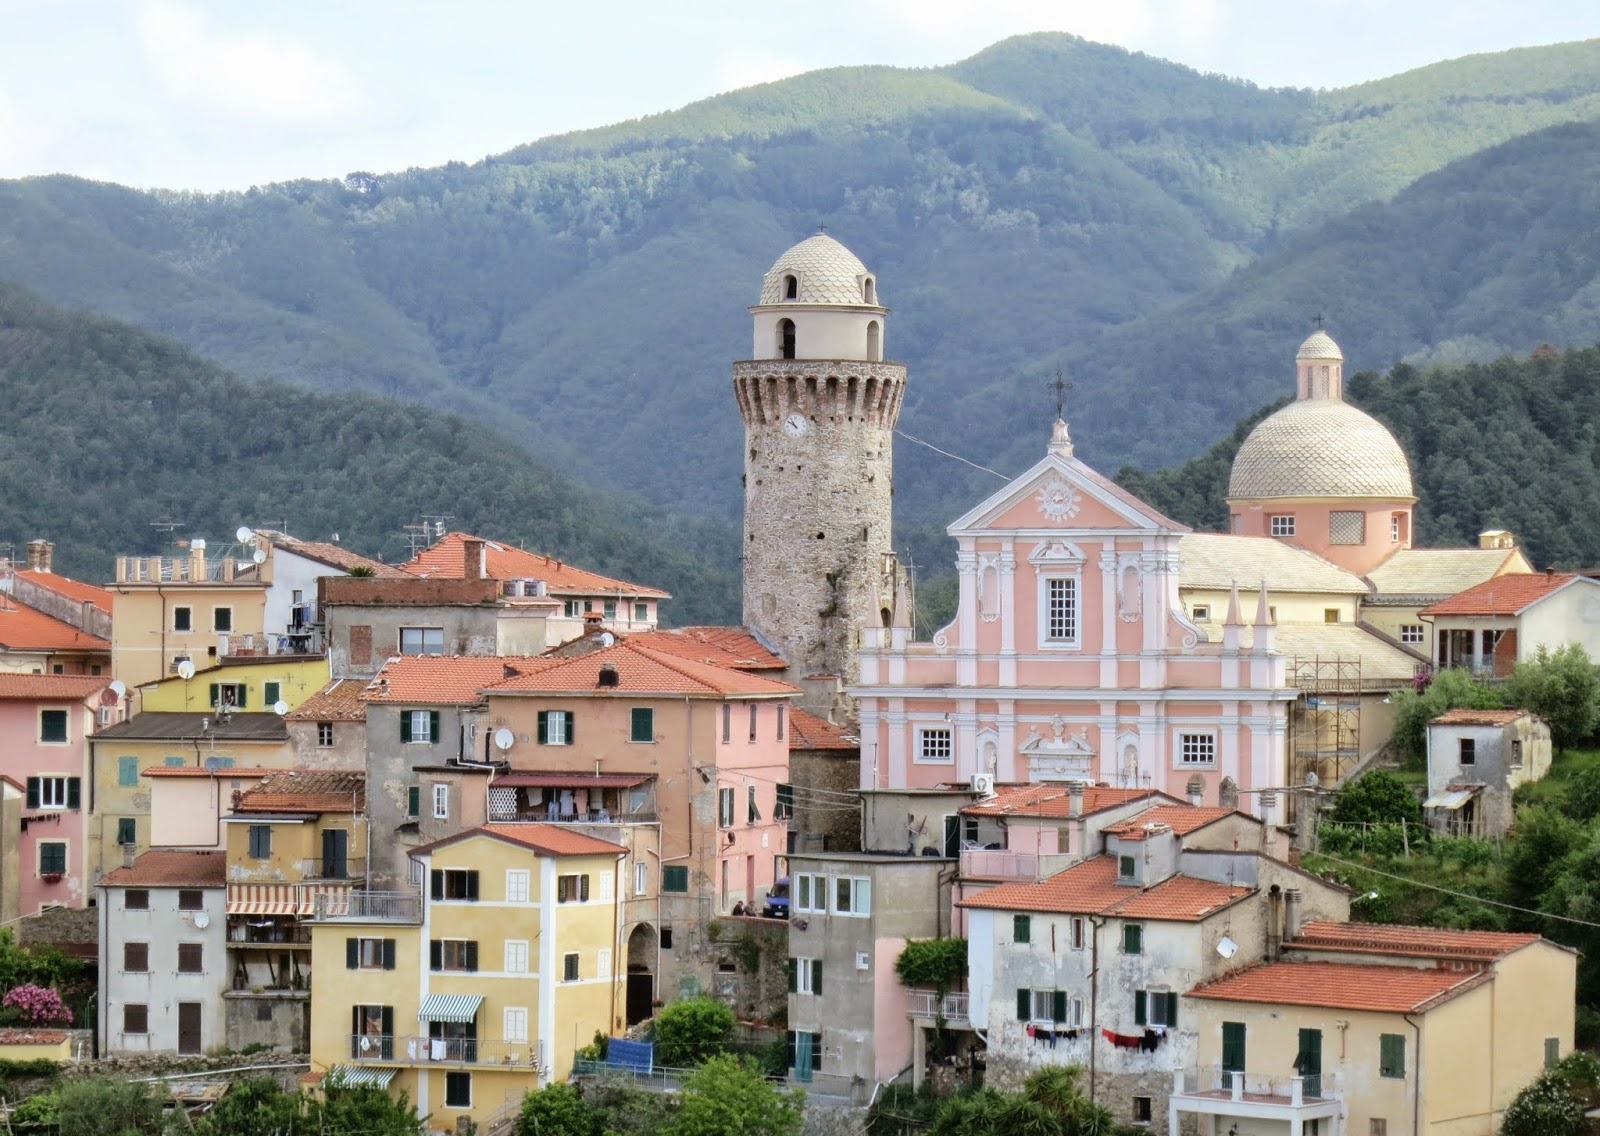 Ortonovo, Liguria